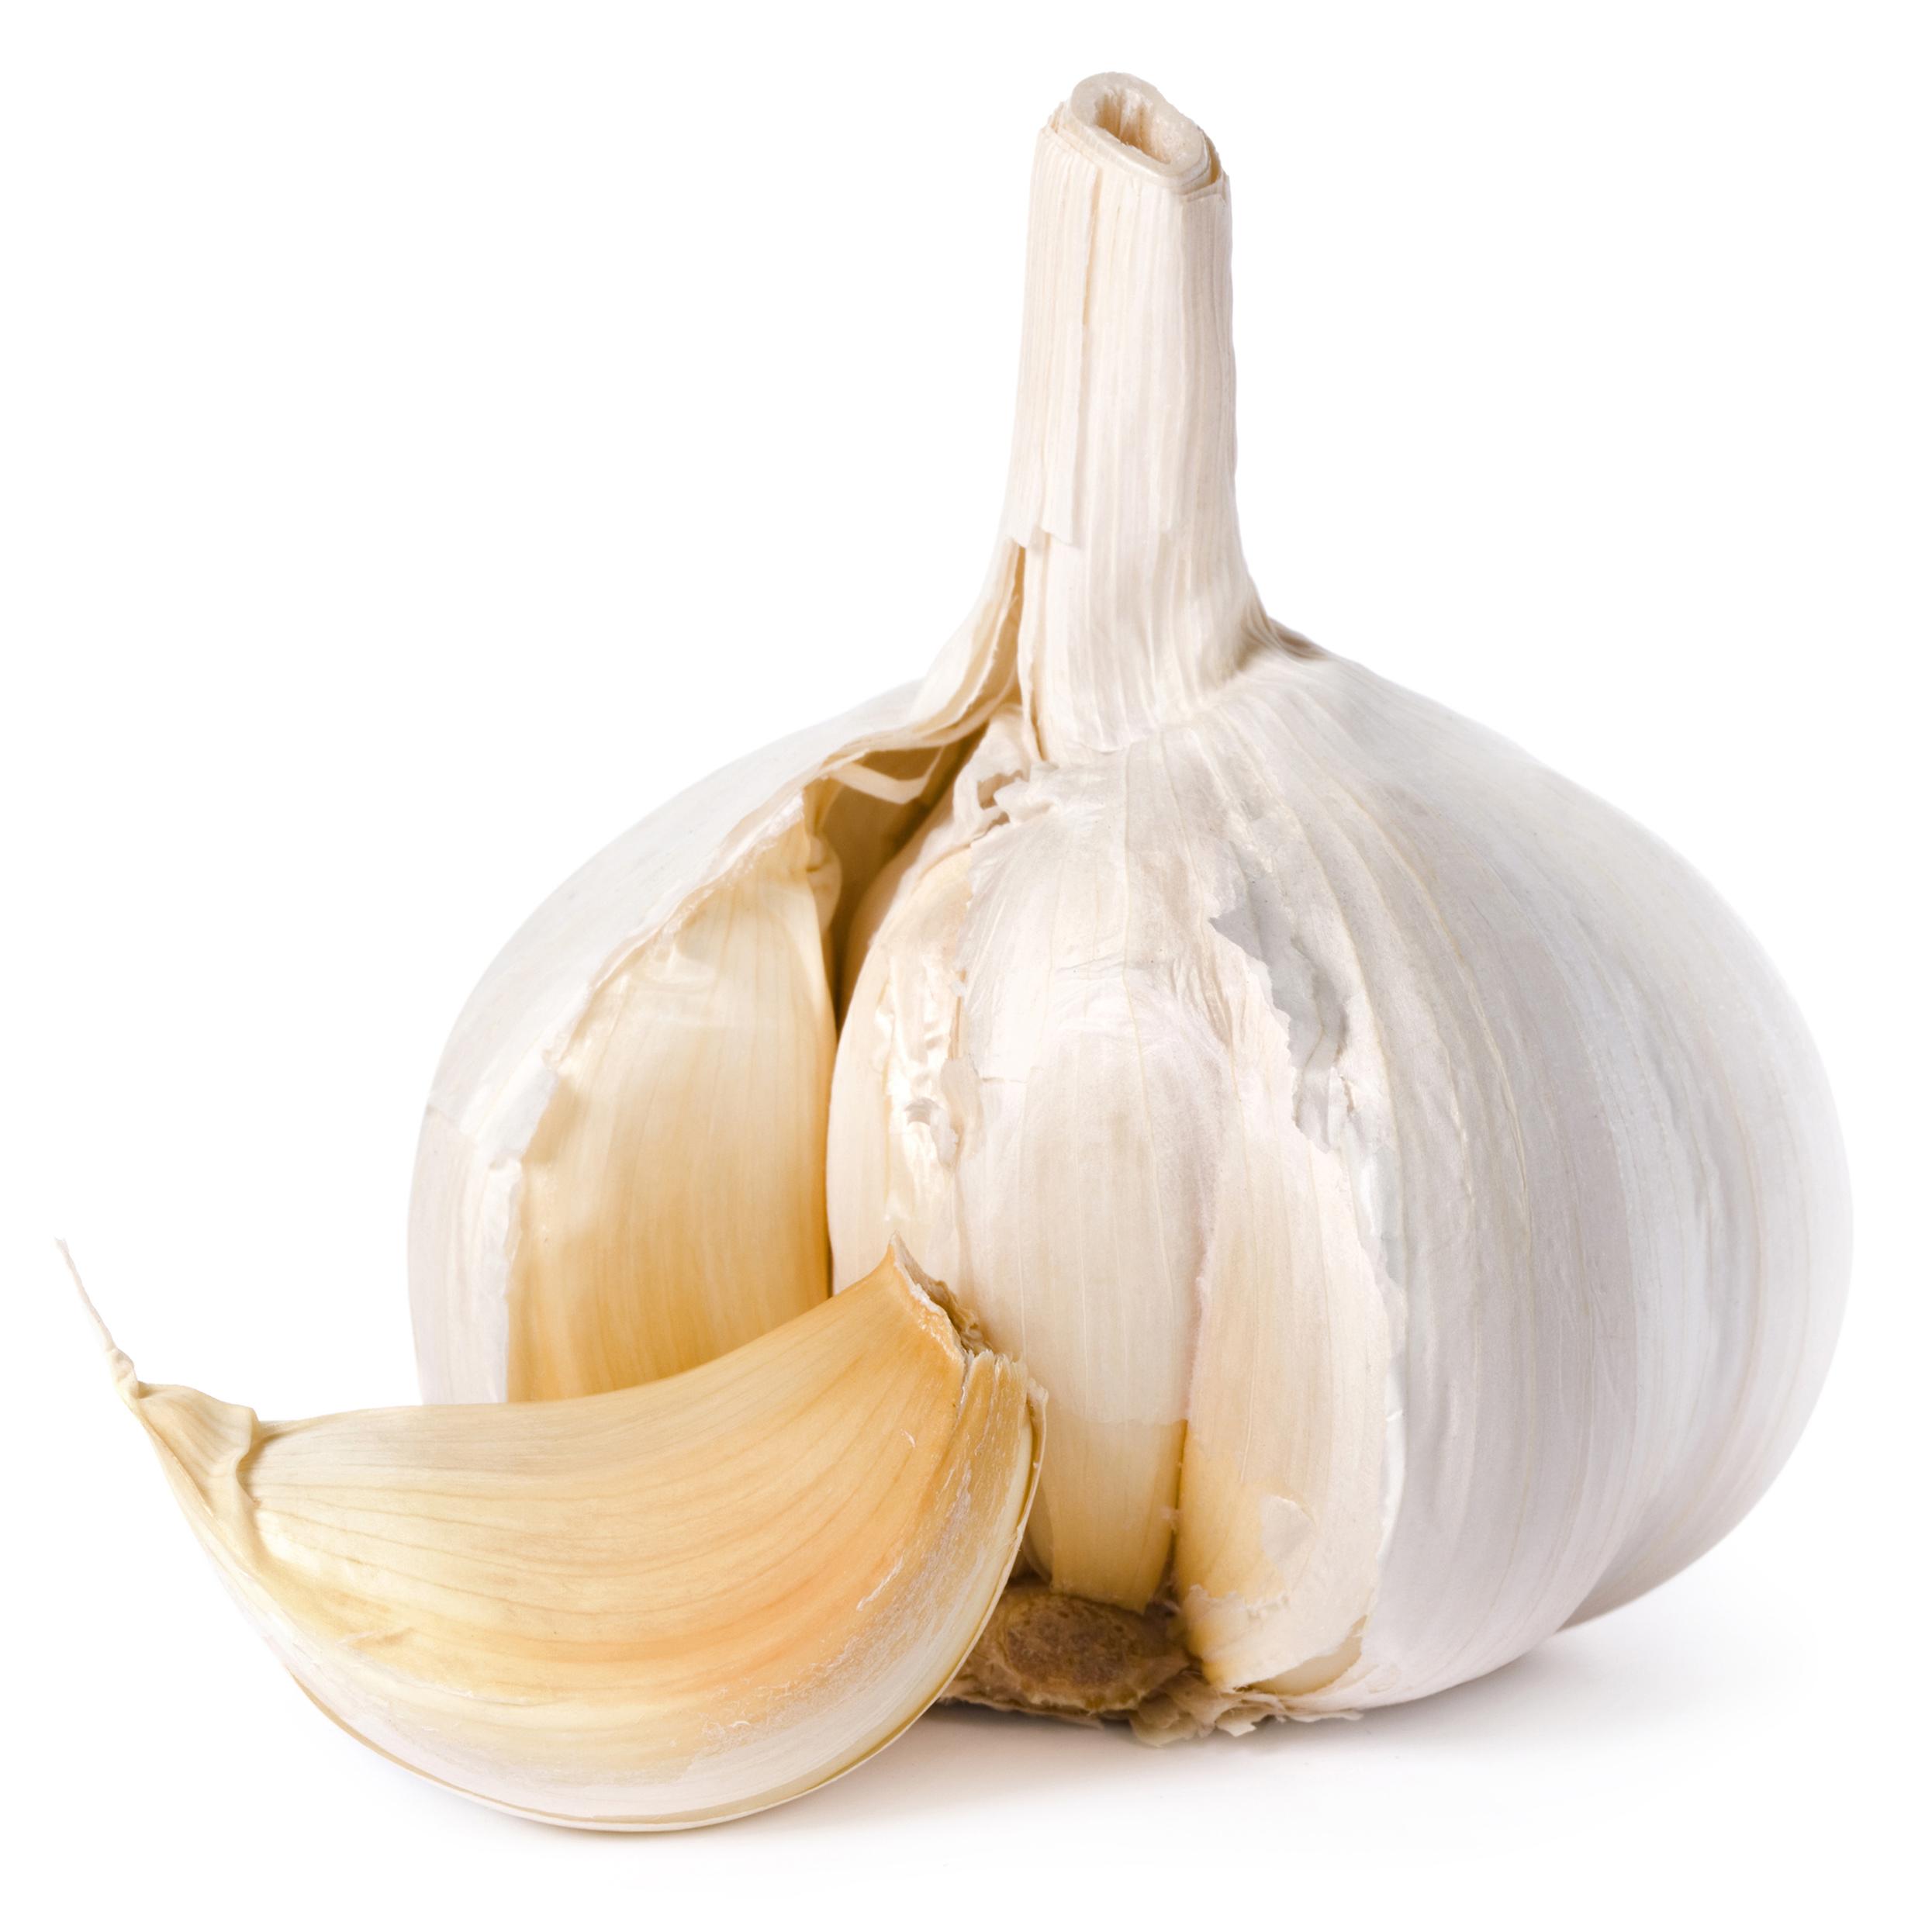 Garlic (Lasan)